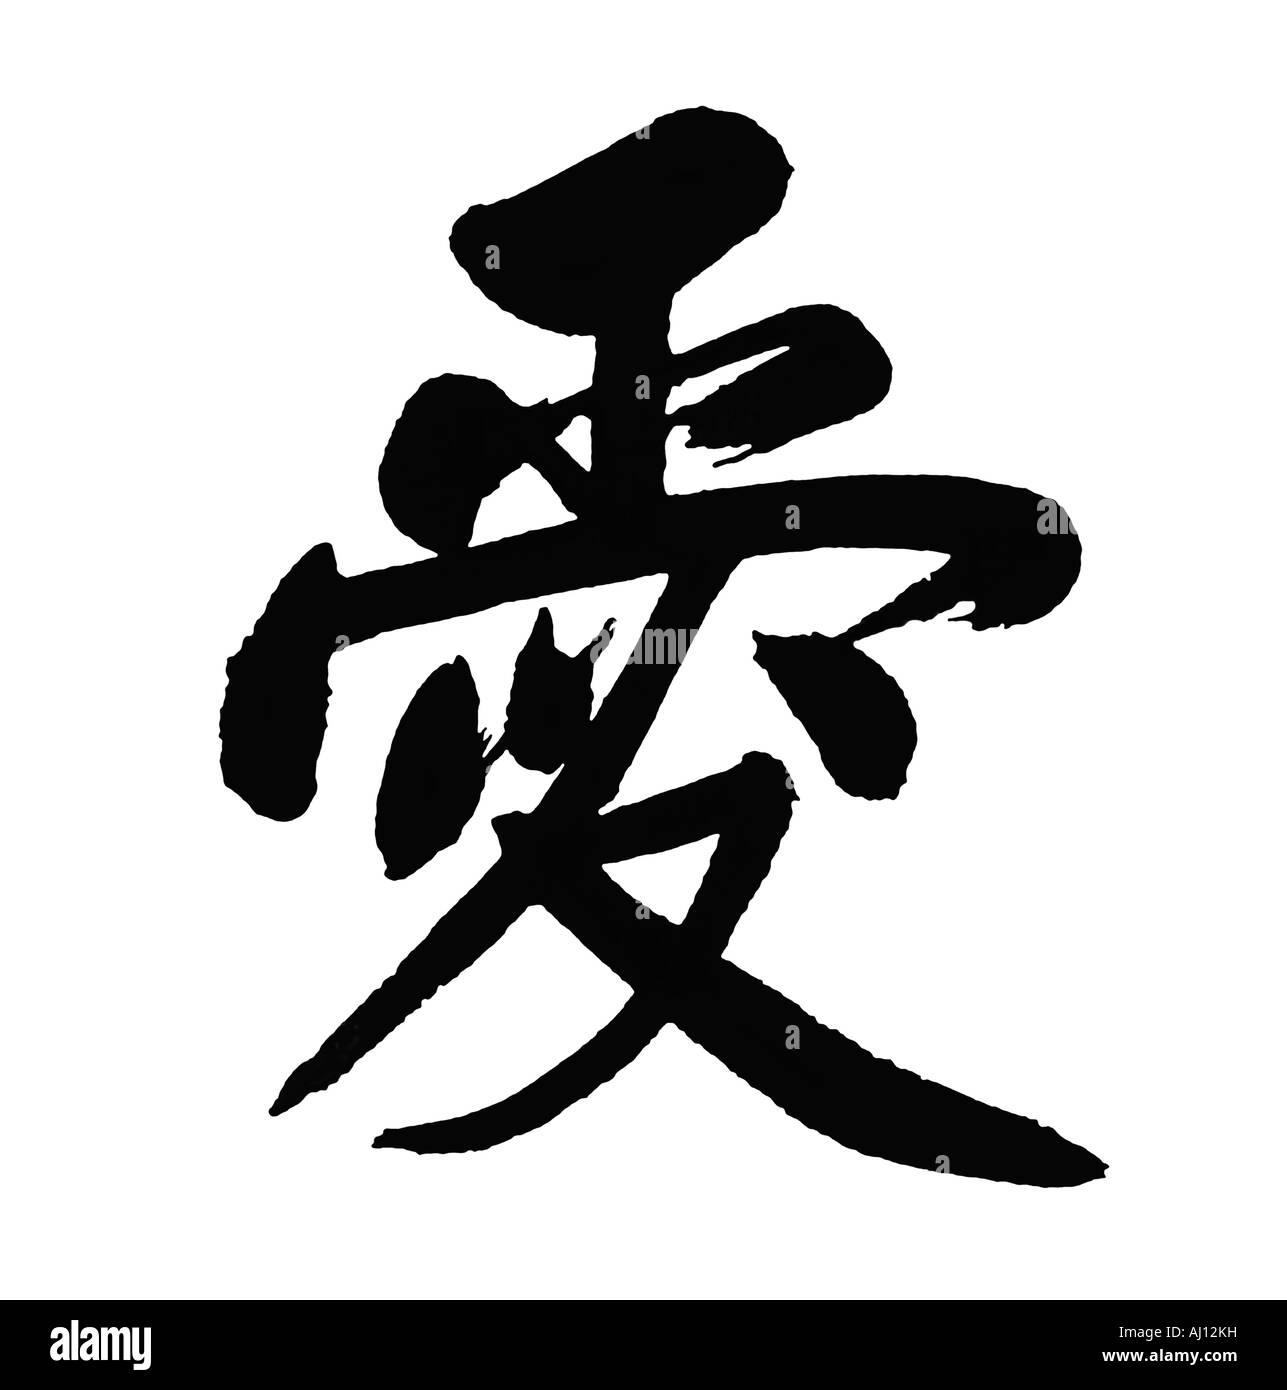 Amor - Script de Chinês Imagens de Stock